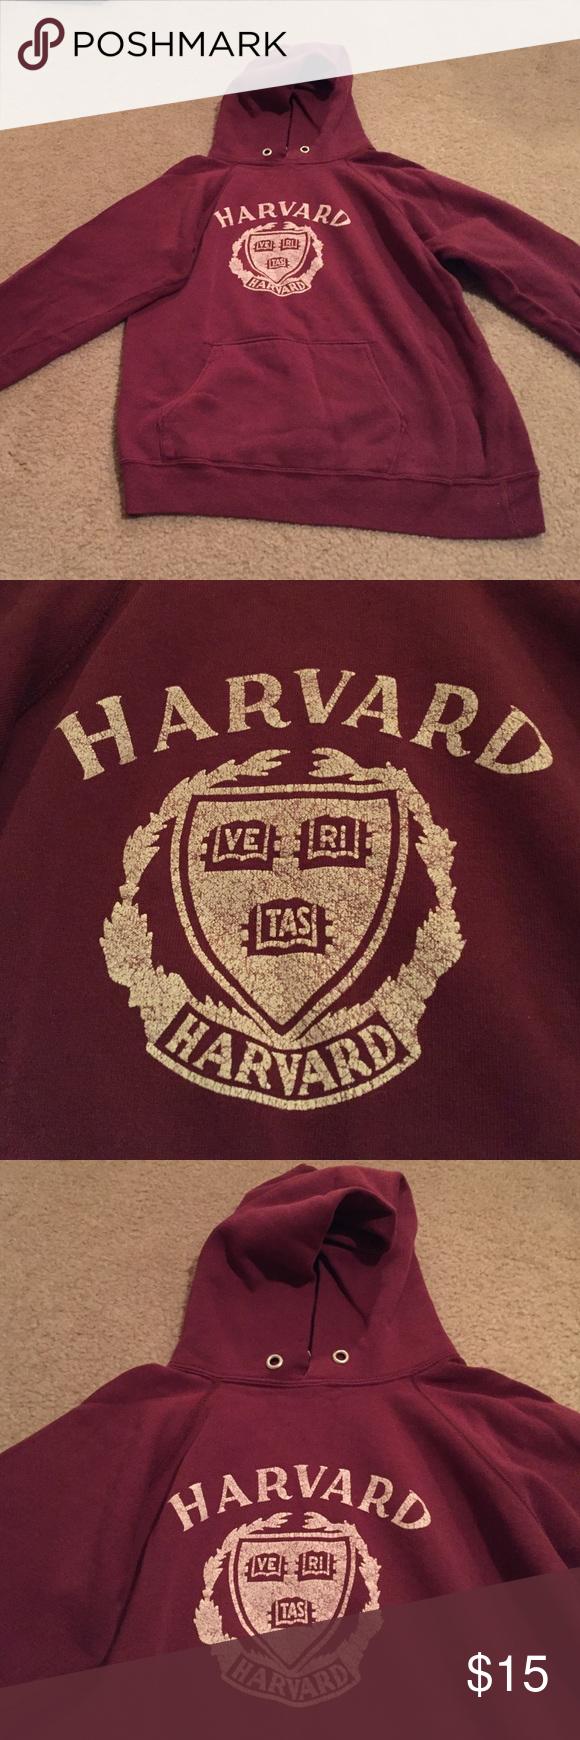 Maroon Large Harvard Sweatshirt Maroon Harvard Large Sweatshirt Champion Tops Sweatshirts & Hoodies